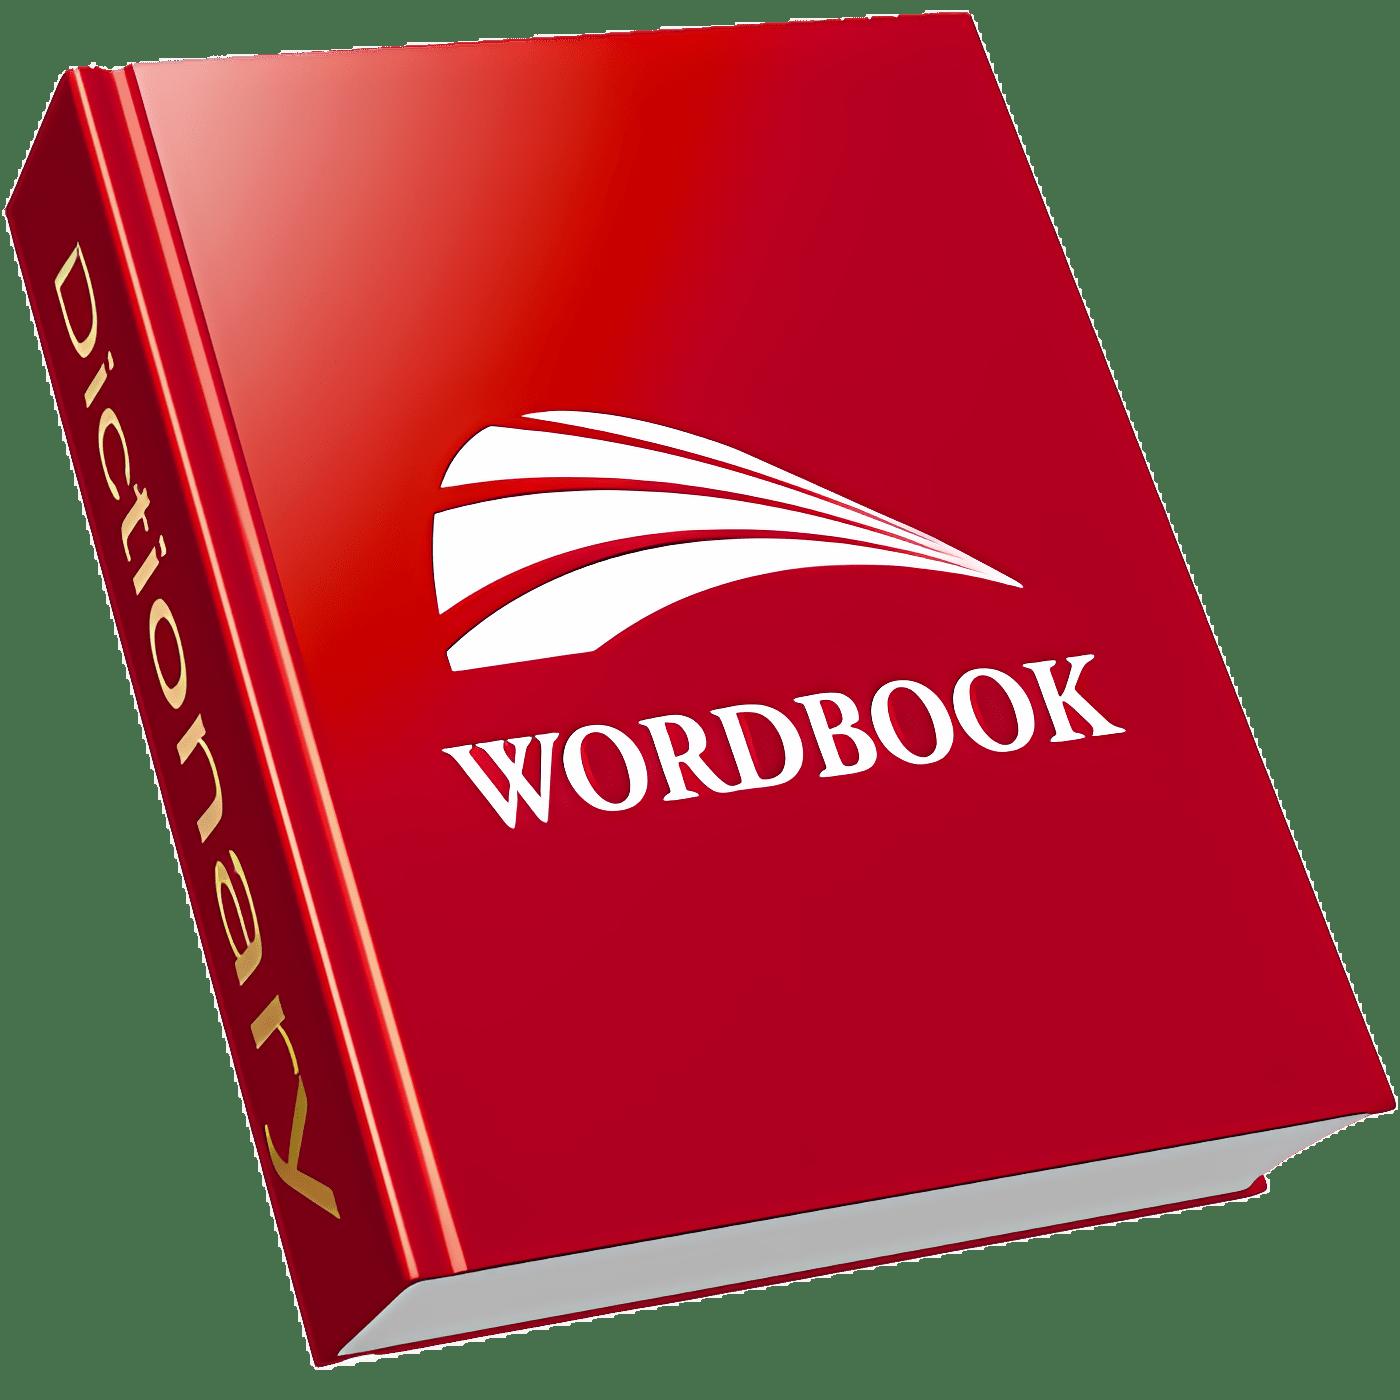 WordBook English Dictionary and Thesaurus 1.2